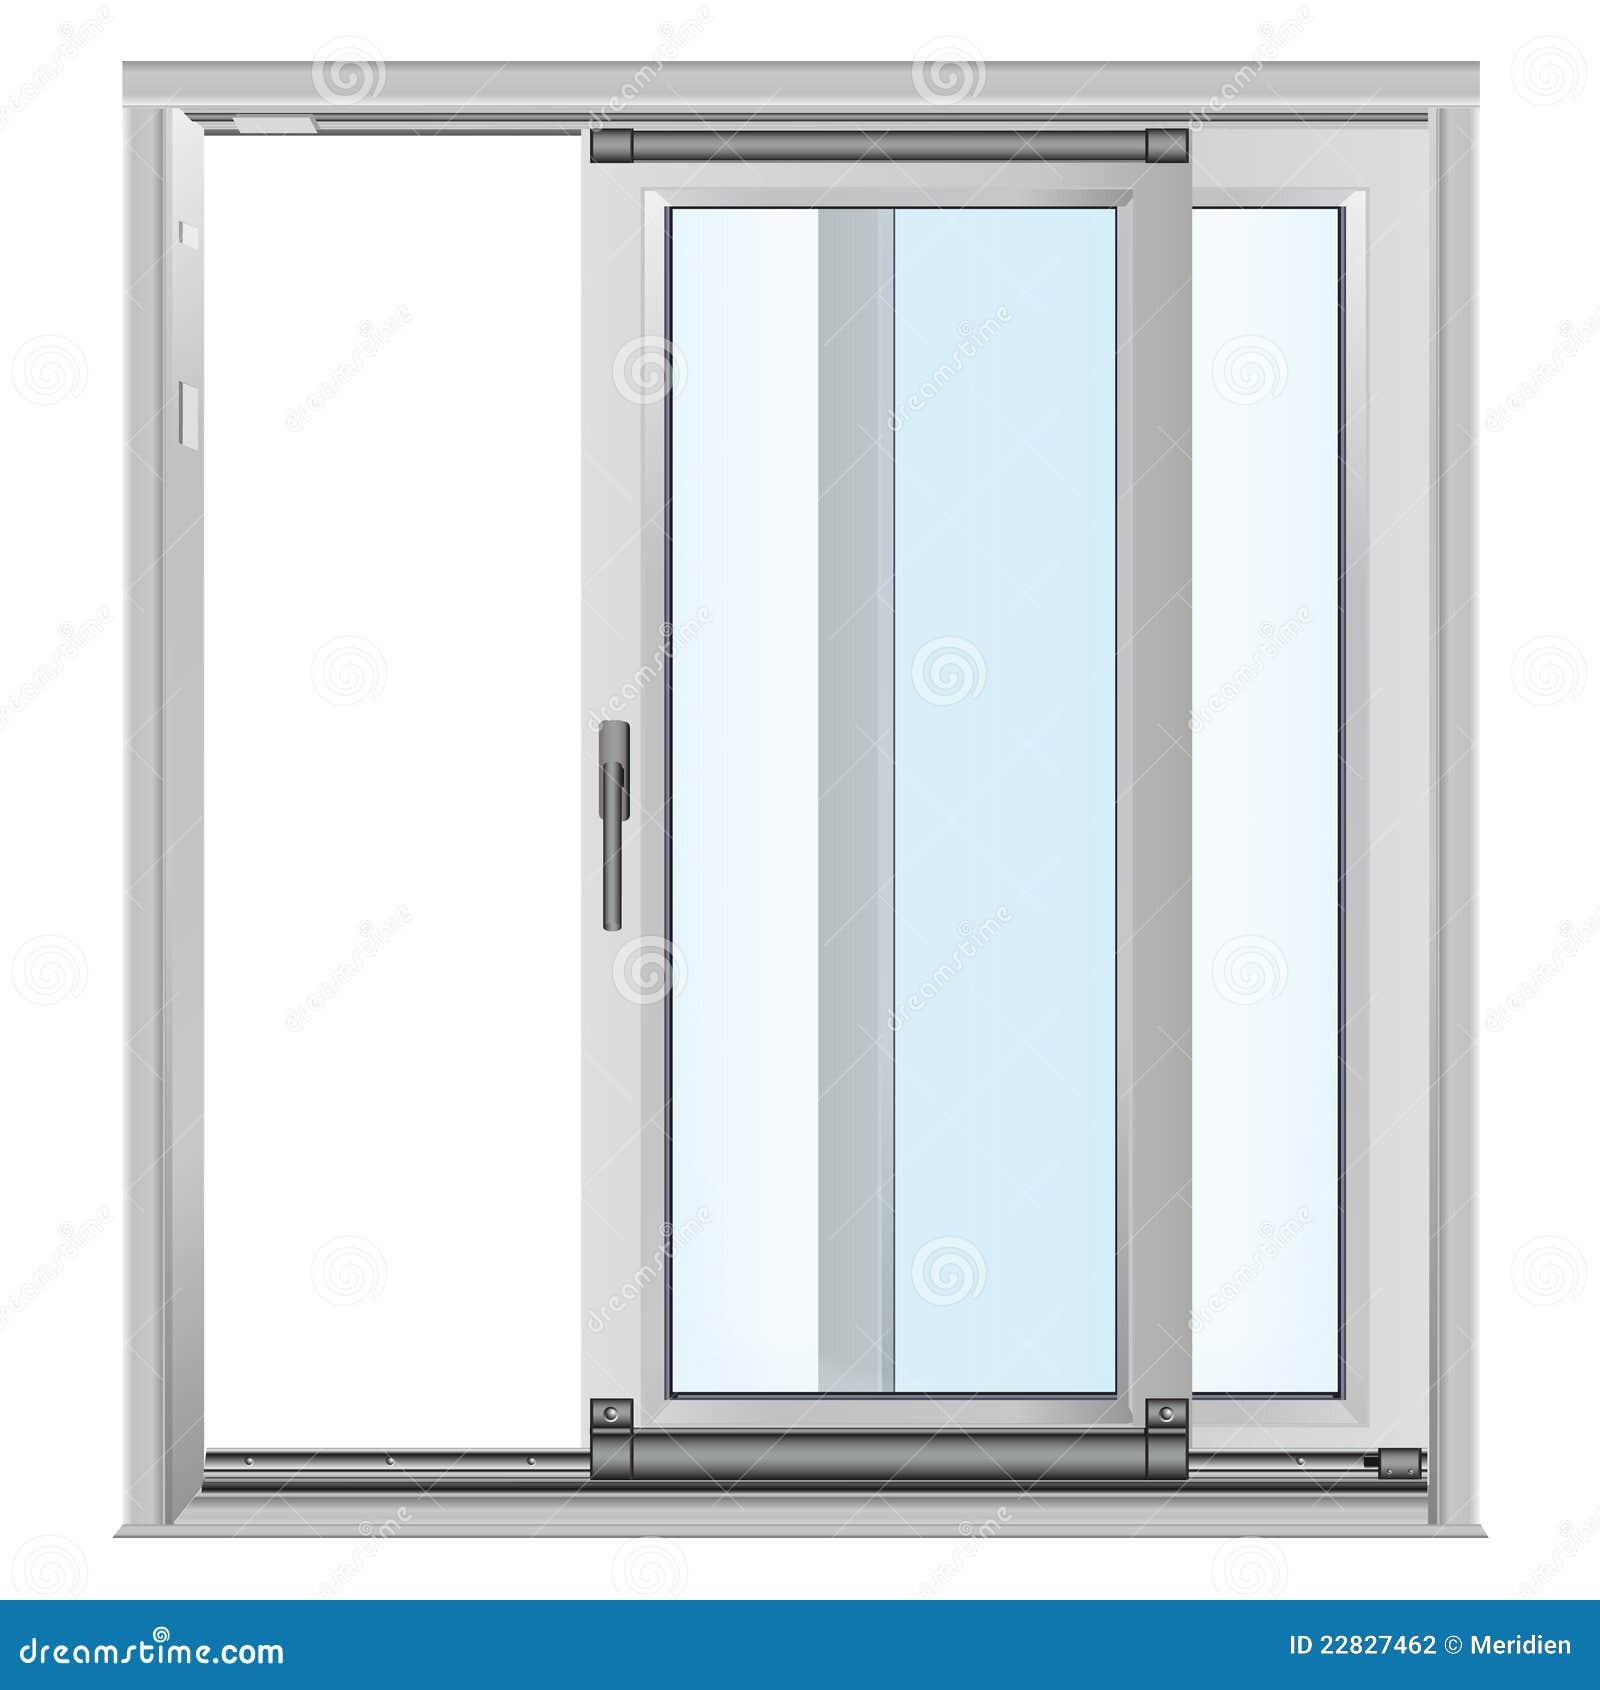 Download comp  sc 1 st  Dreamstime.com & Plastics glasses door stock vector. Illustration of house - 22827462